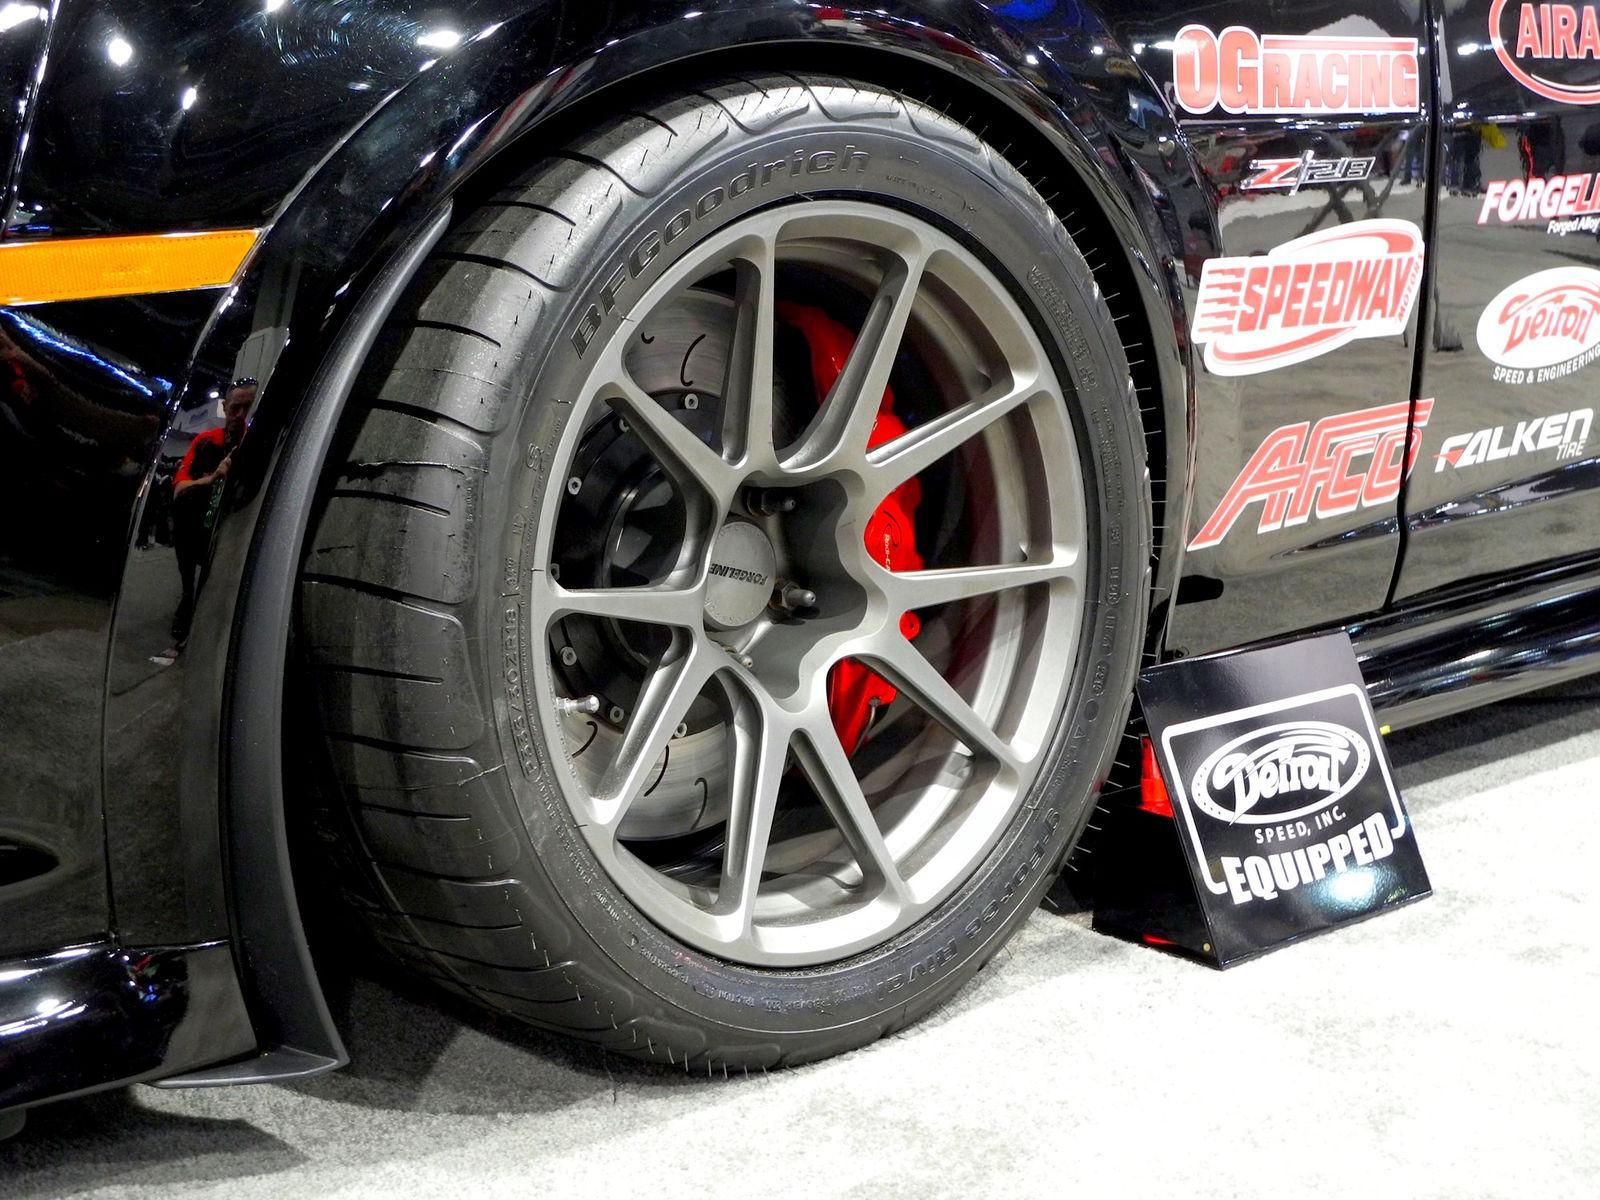 2014 Chevrolet Camaro | Ken Thwaits' Showtime Motorsports Camaro Z/28 on Forgeline One Piece Forged Monoblock GA1R Open Lug Open Lug Cap Edition Wheels